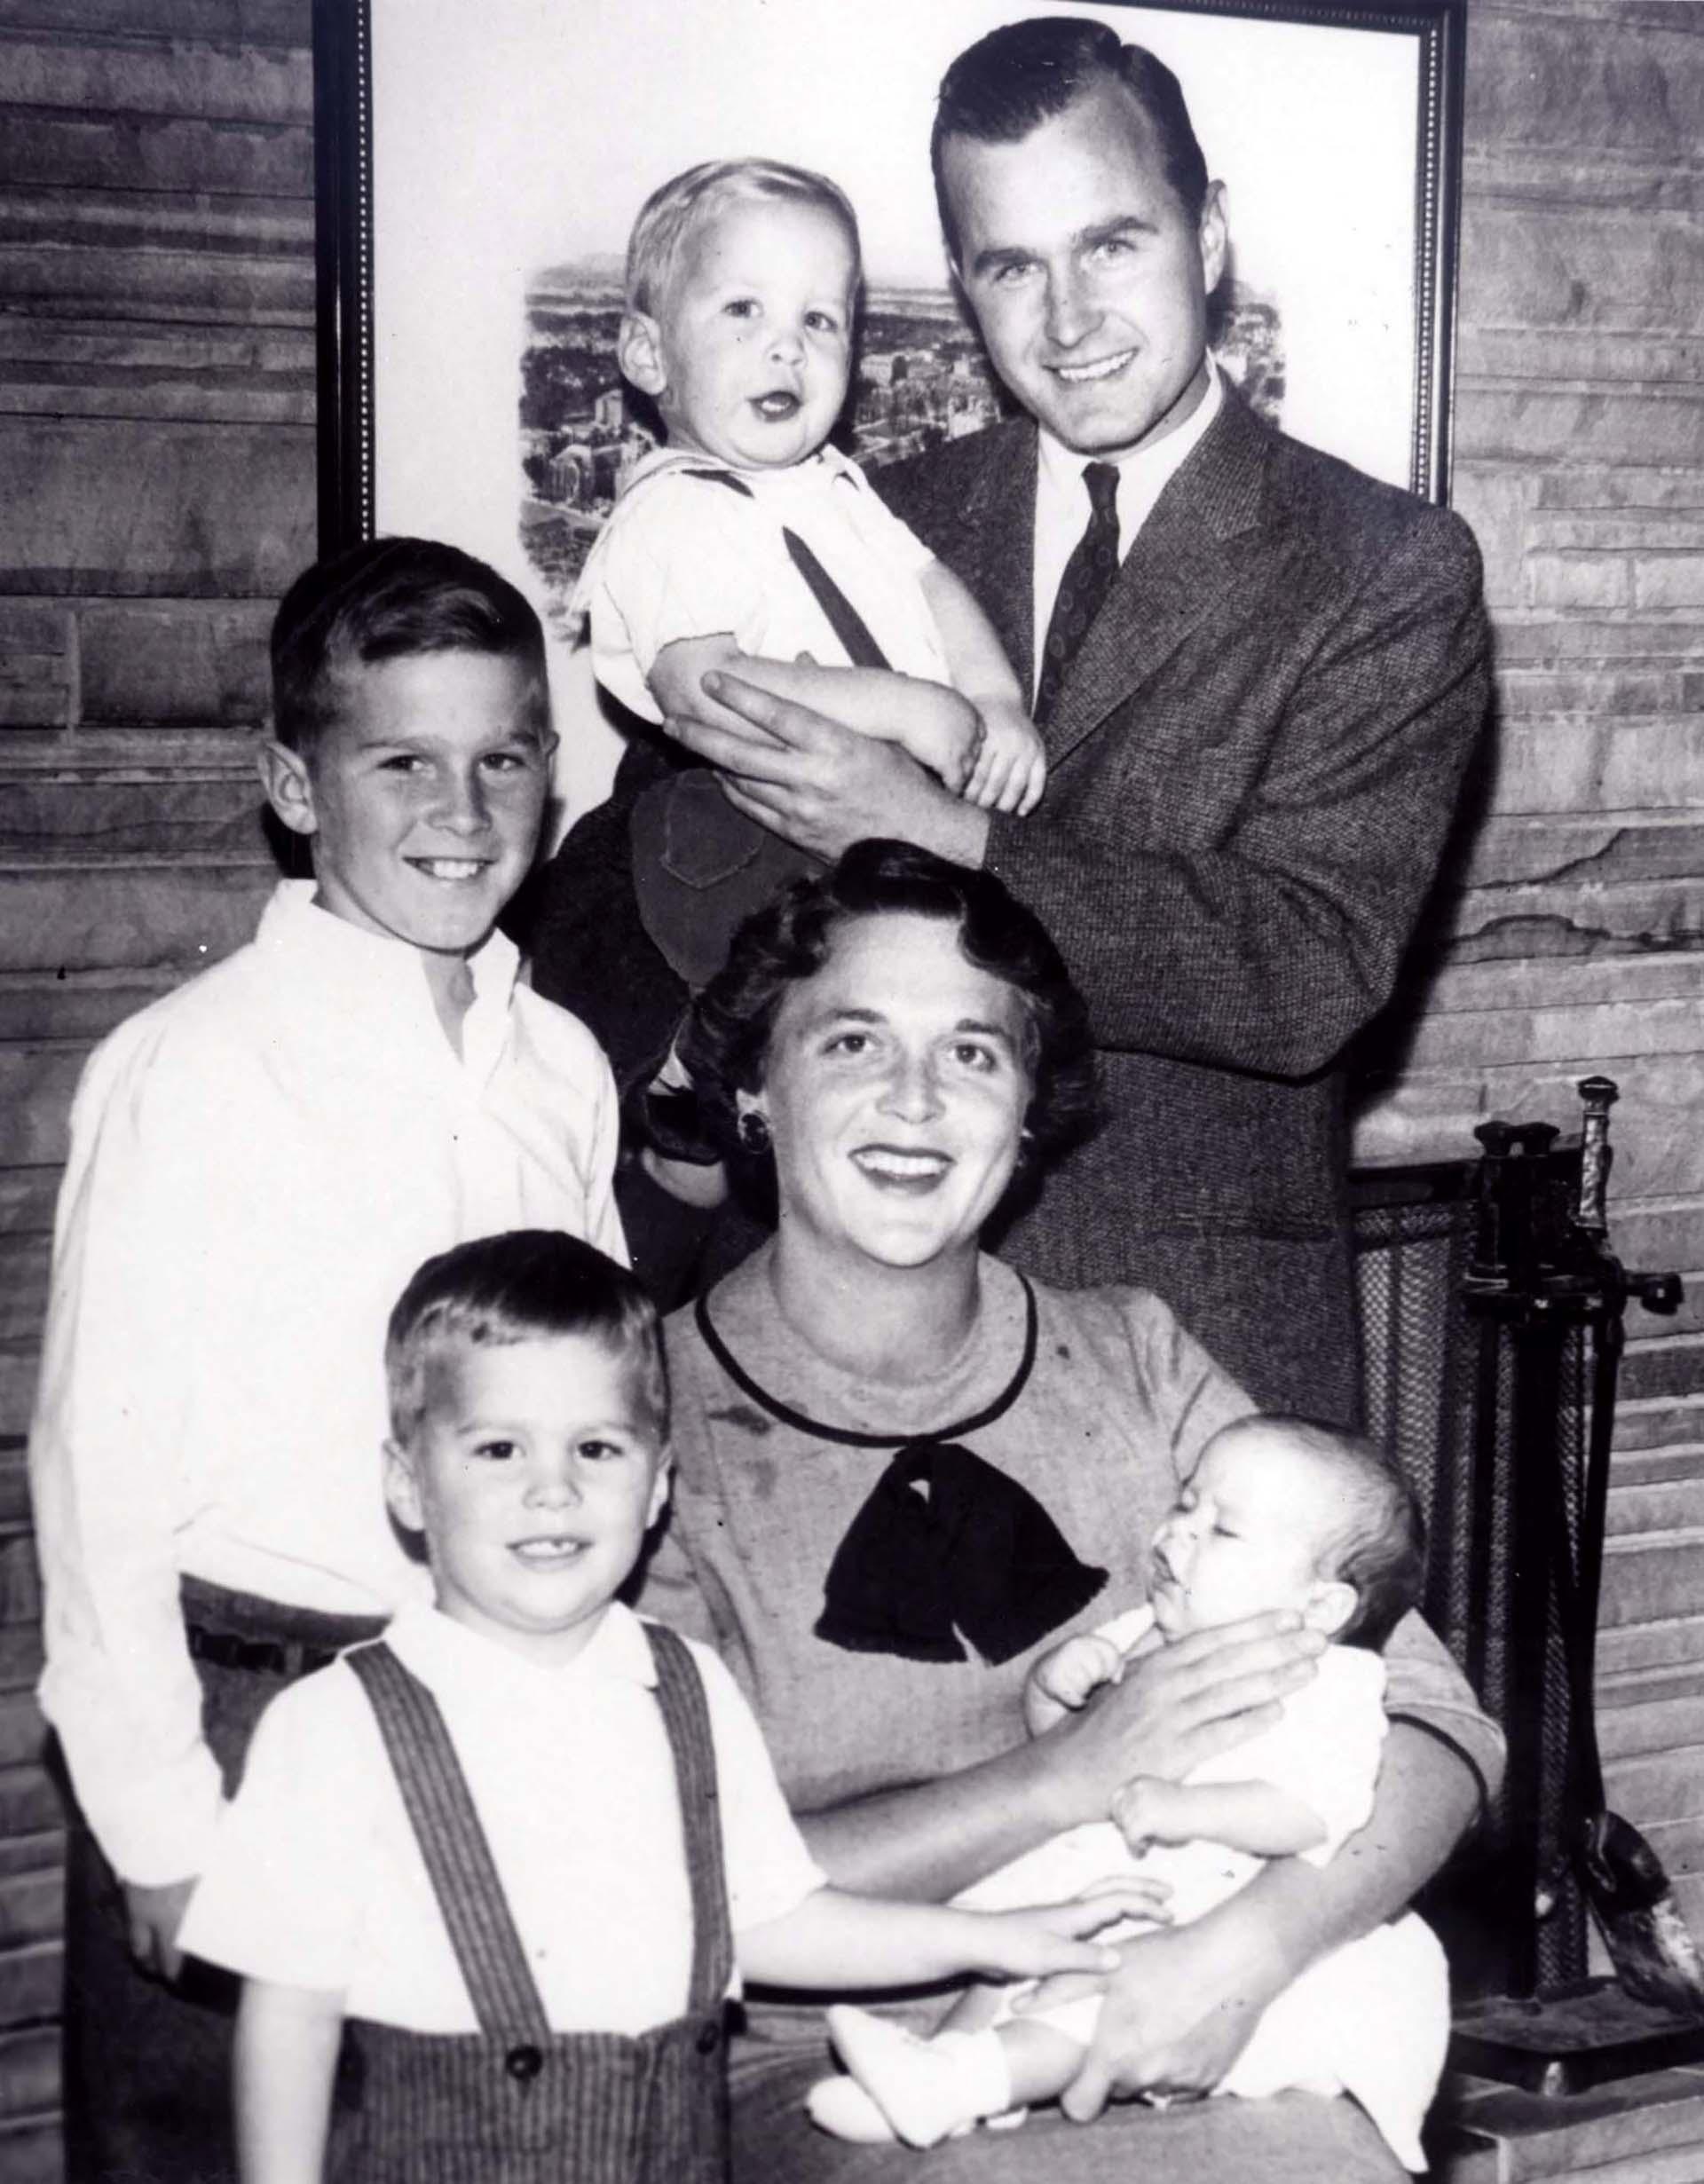 La familia Bush en 1956: GeorgeH.W., Neil, George W., Barbara, Jeb y Marvin